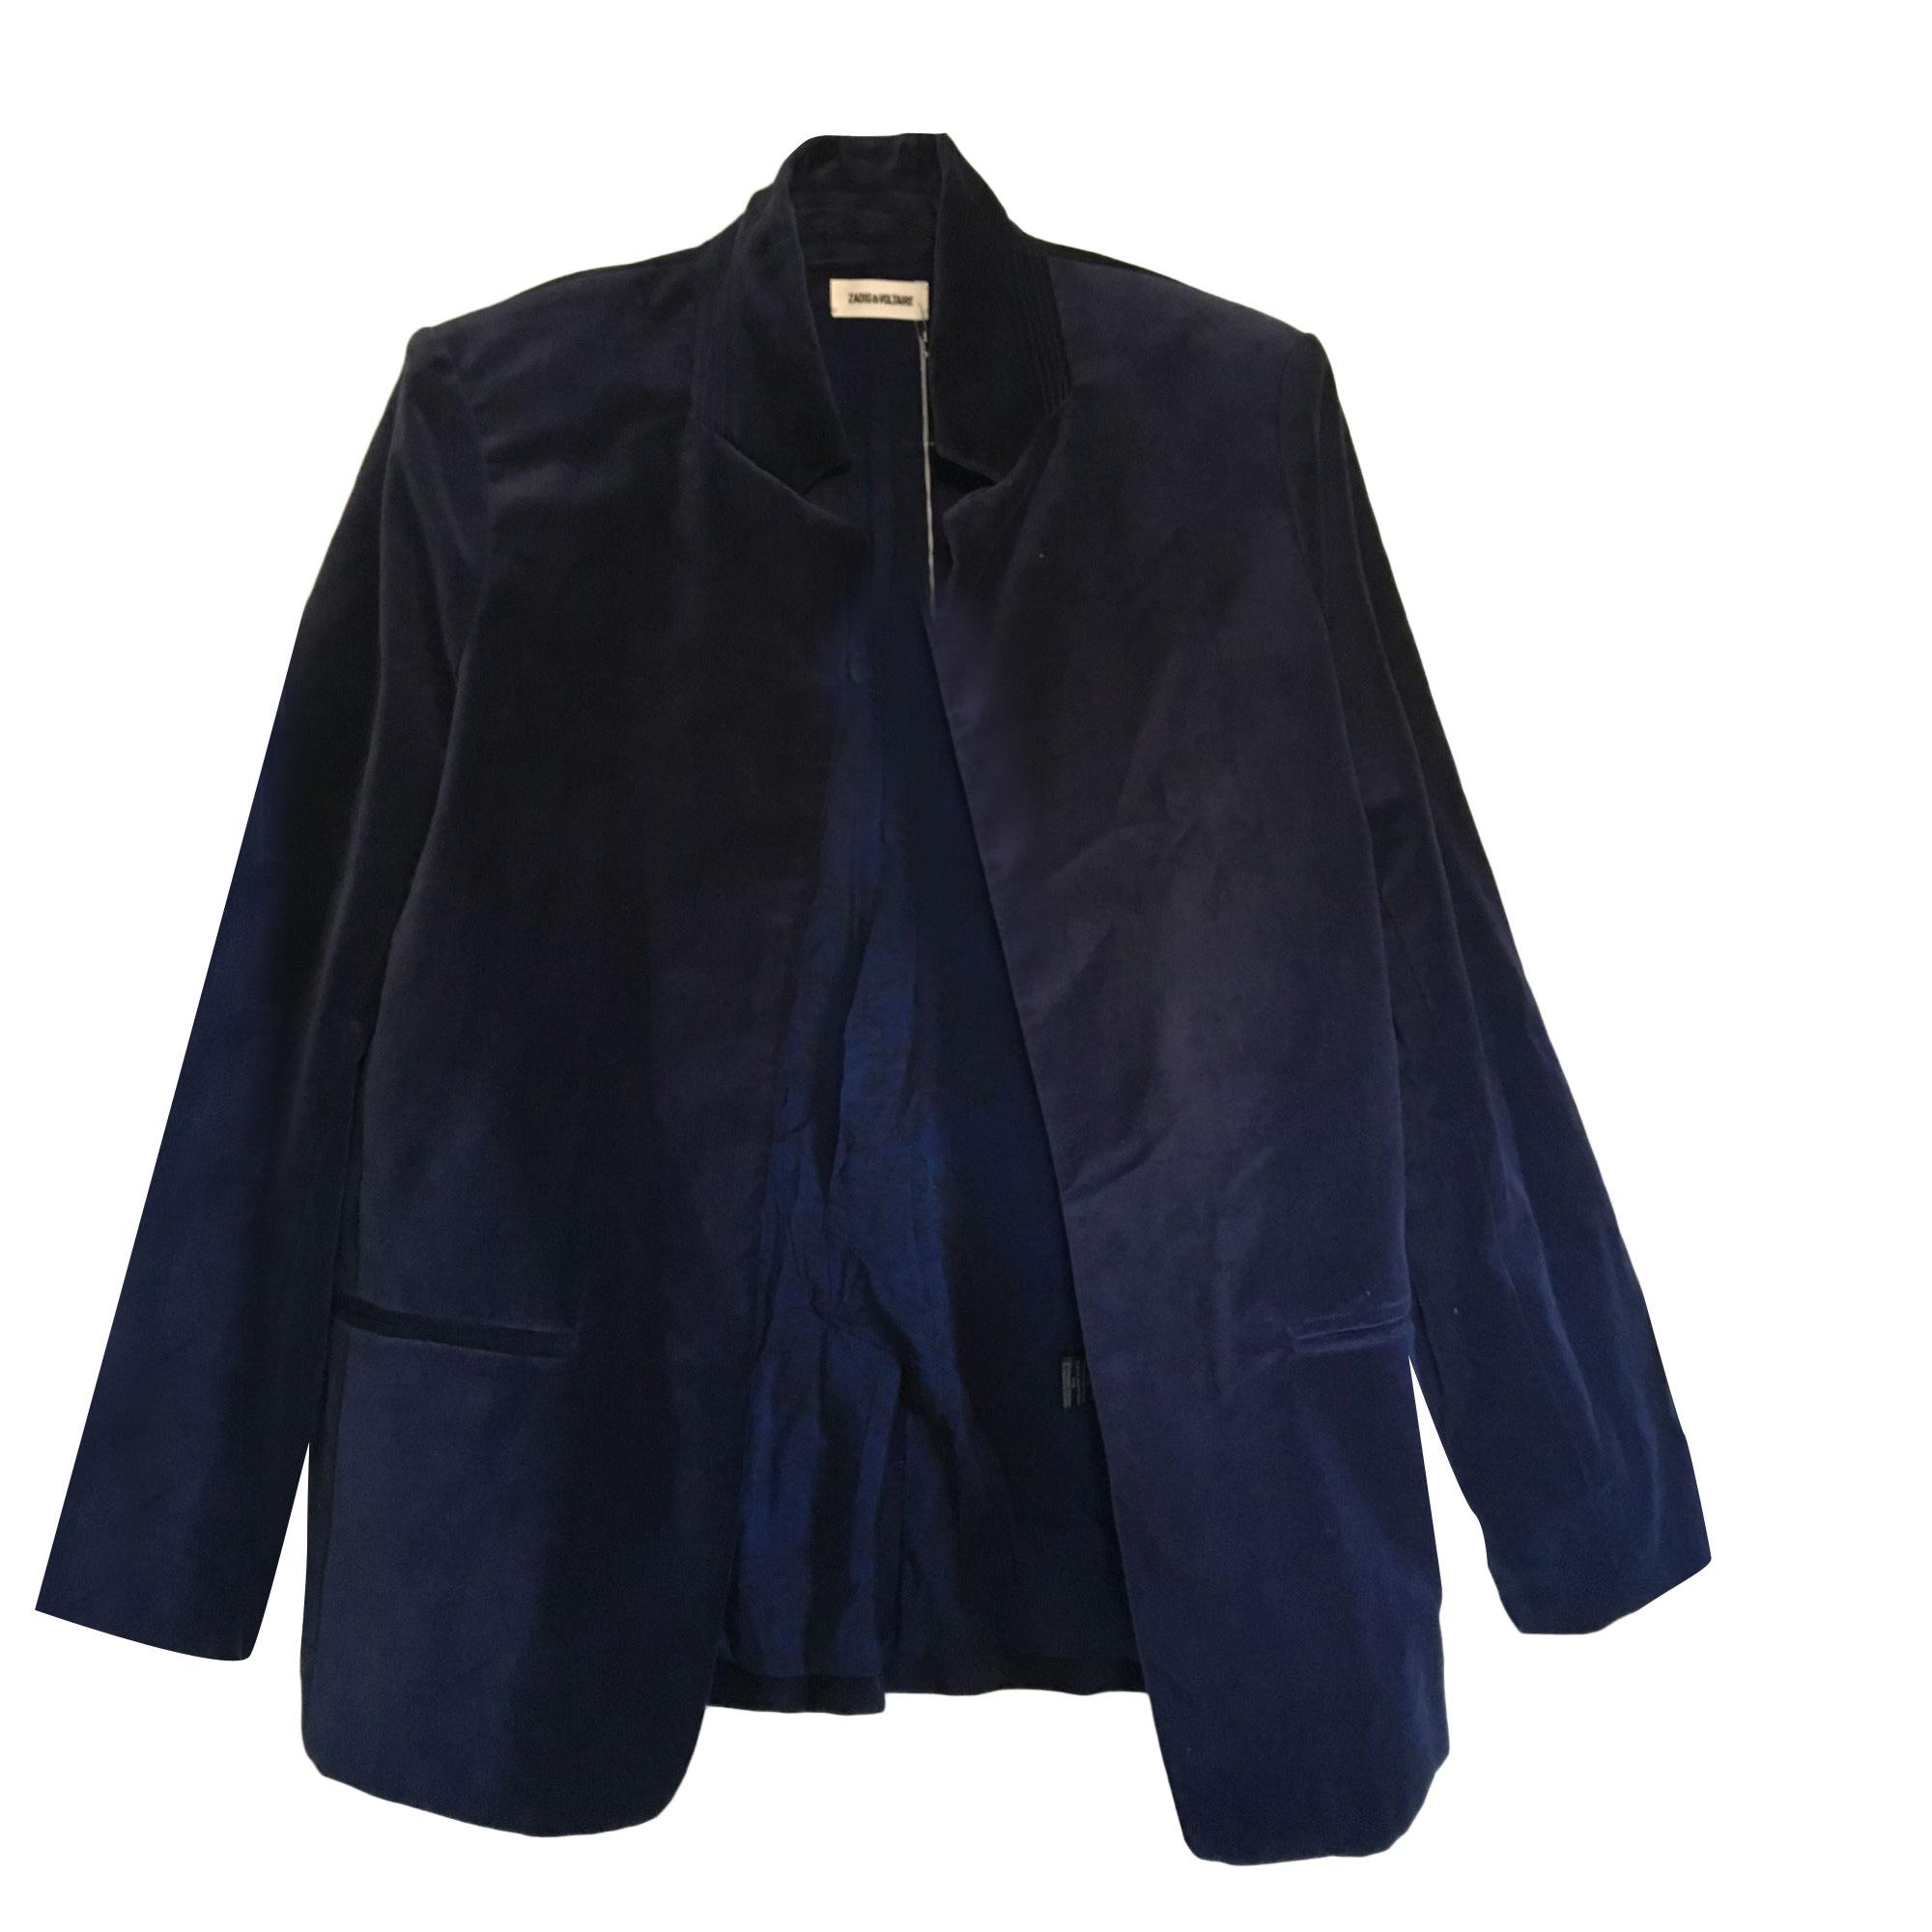 Blazer, veste tailleur ZADIG & VOLTAIRE Bleu, bleu marine, bleu turquoise